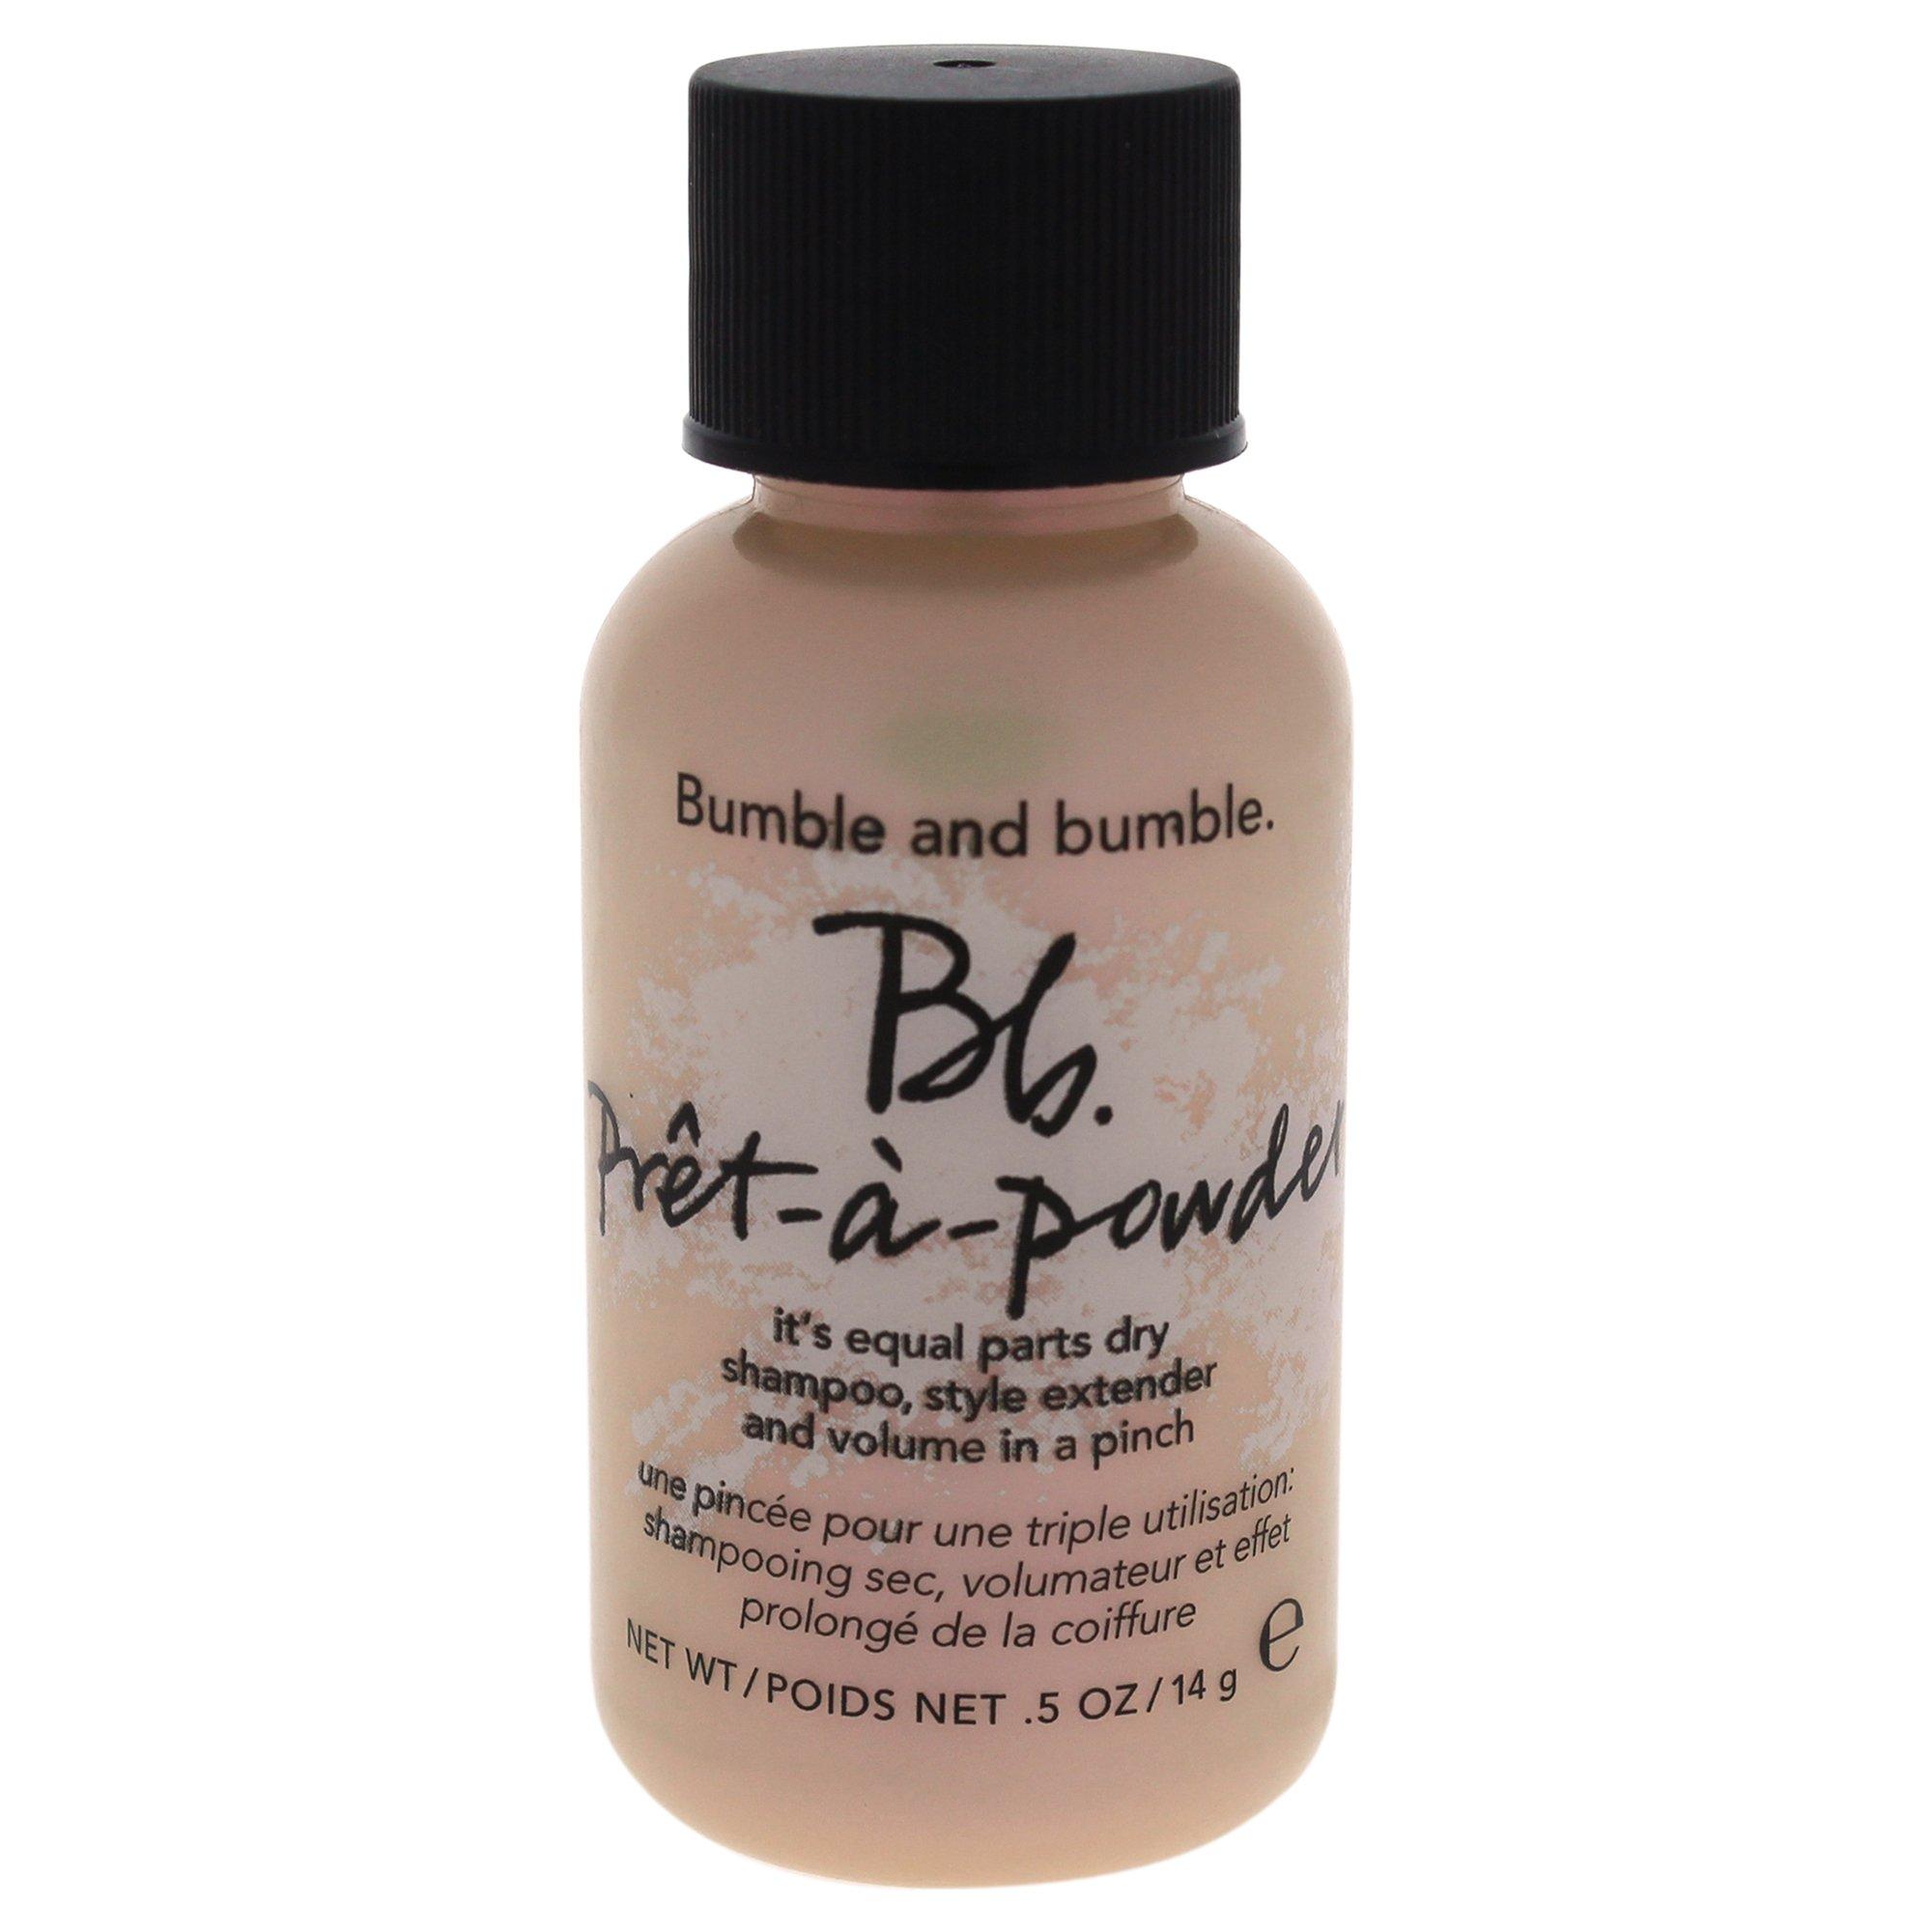 Amazon.com : Bumble and Bumble Pret A Powder Shampoo, 2